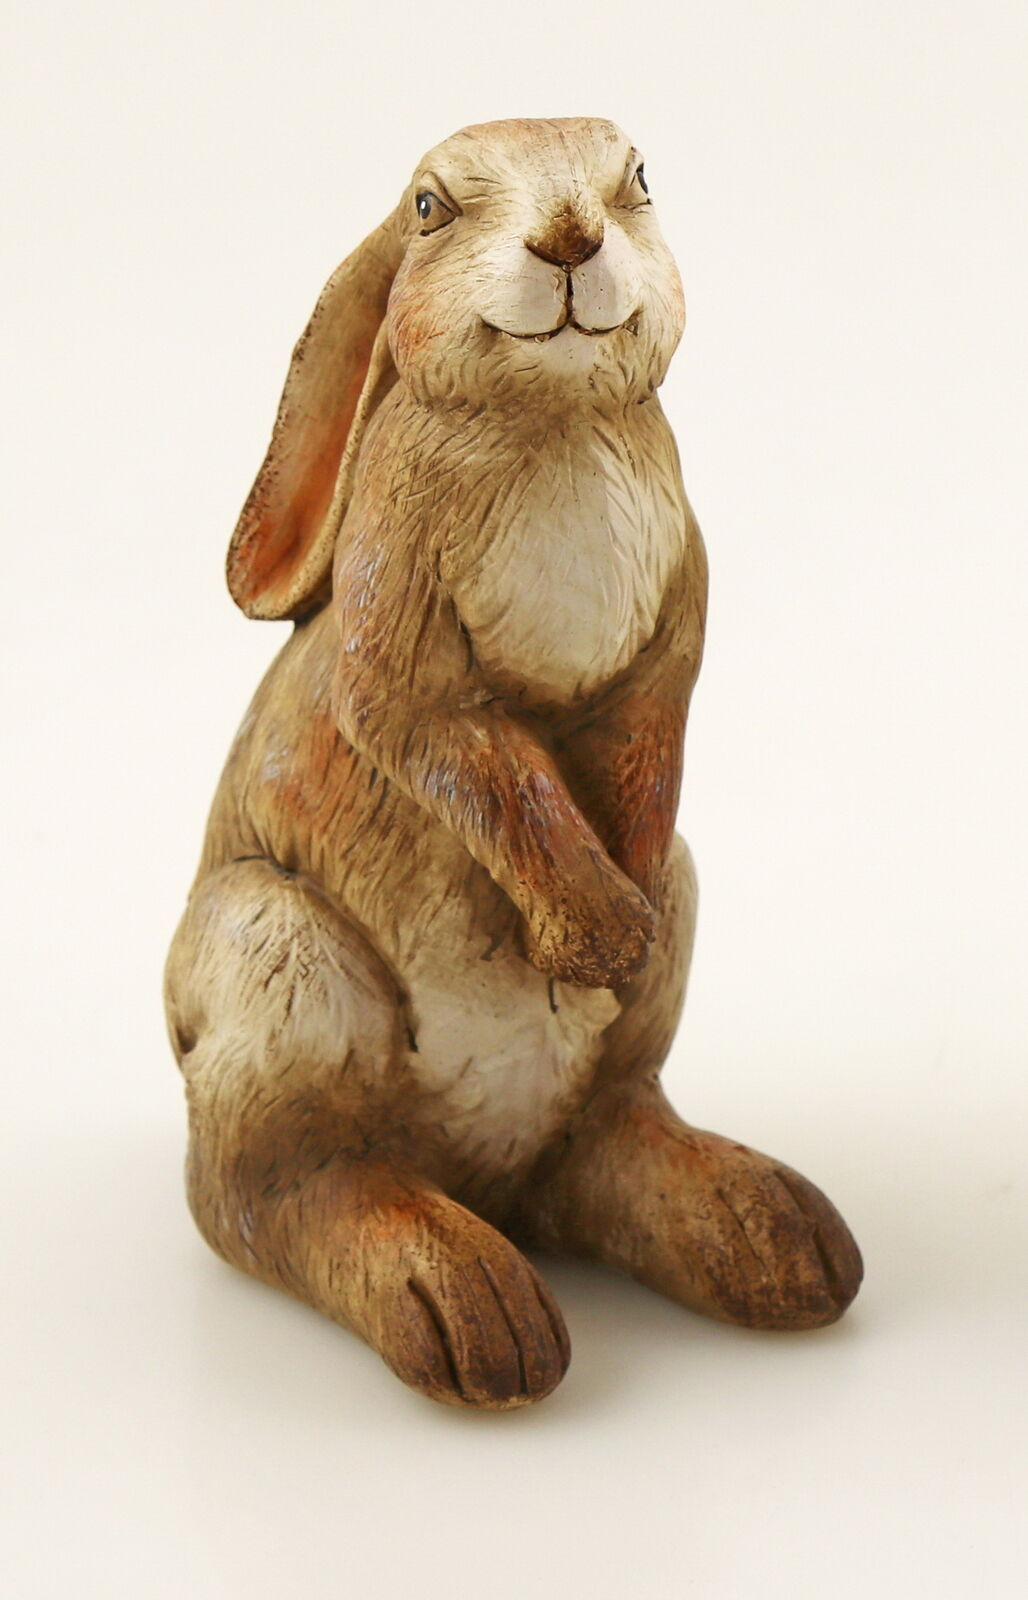 Hase Oster Hasen Kaninchen Deko Garten Figur Dekohase Skulptur Statue Artikel